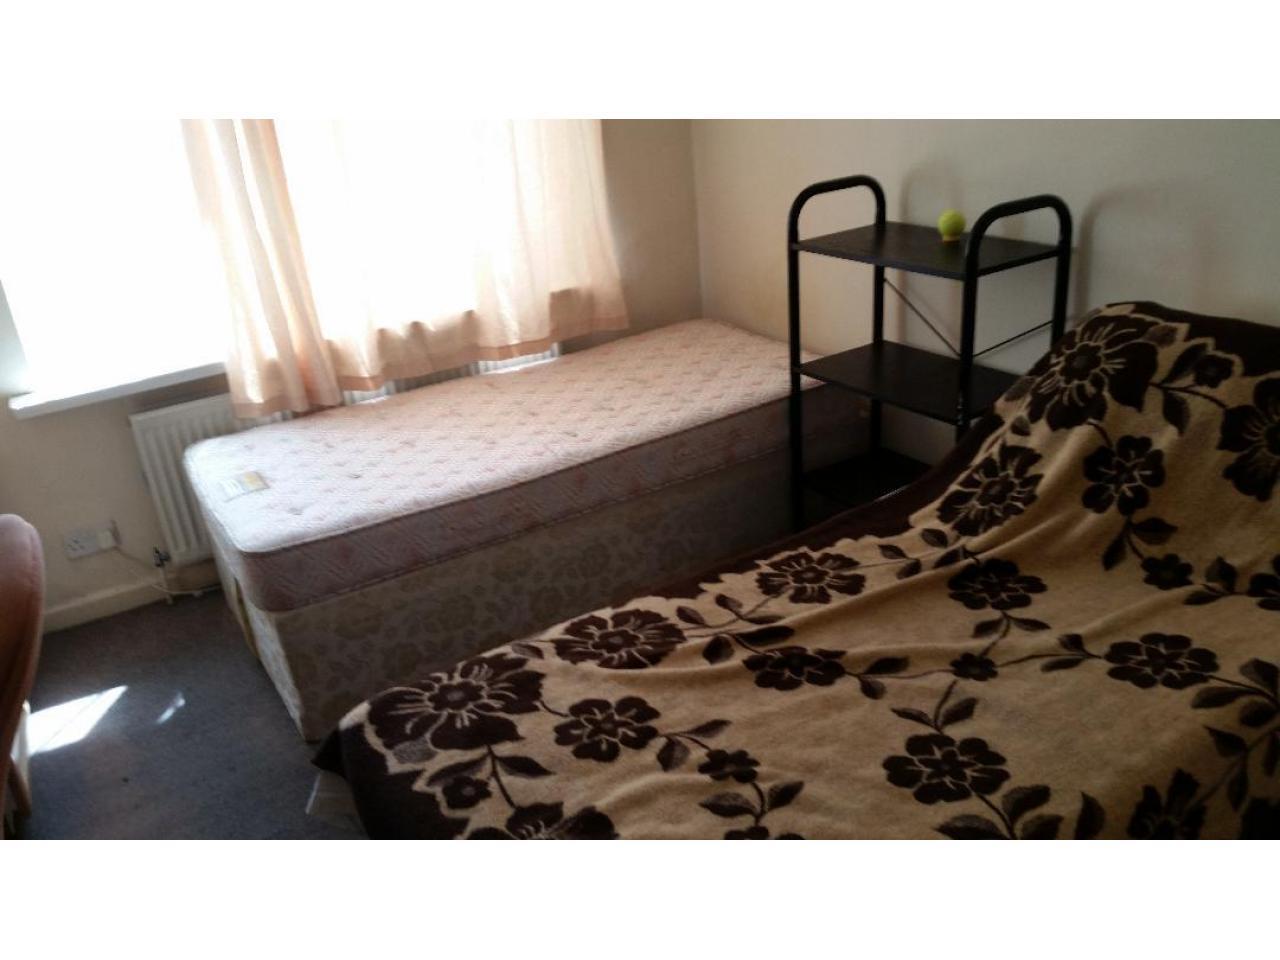 Double Room  Hounslow East £125 - 2